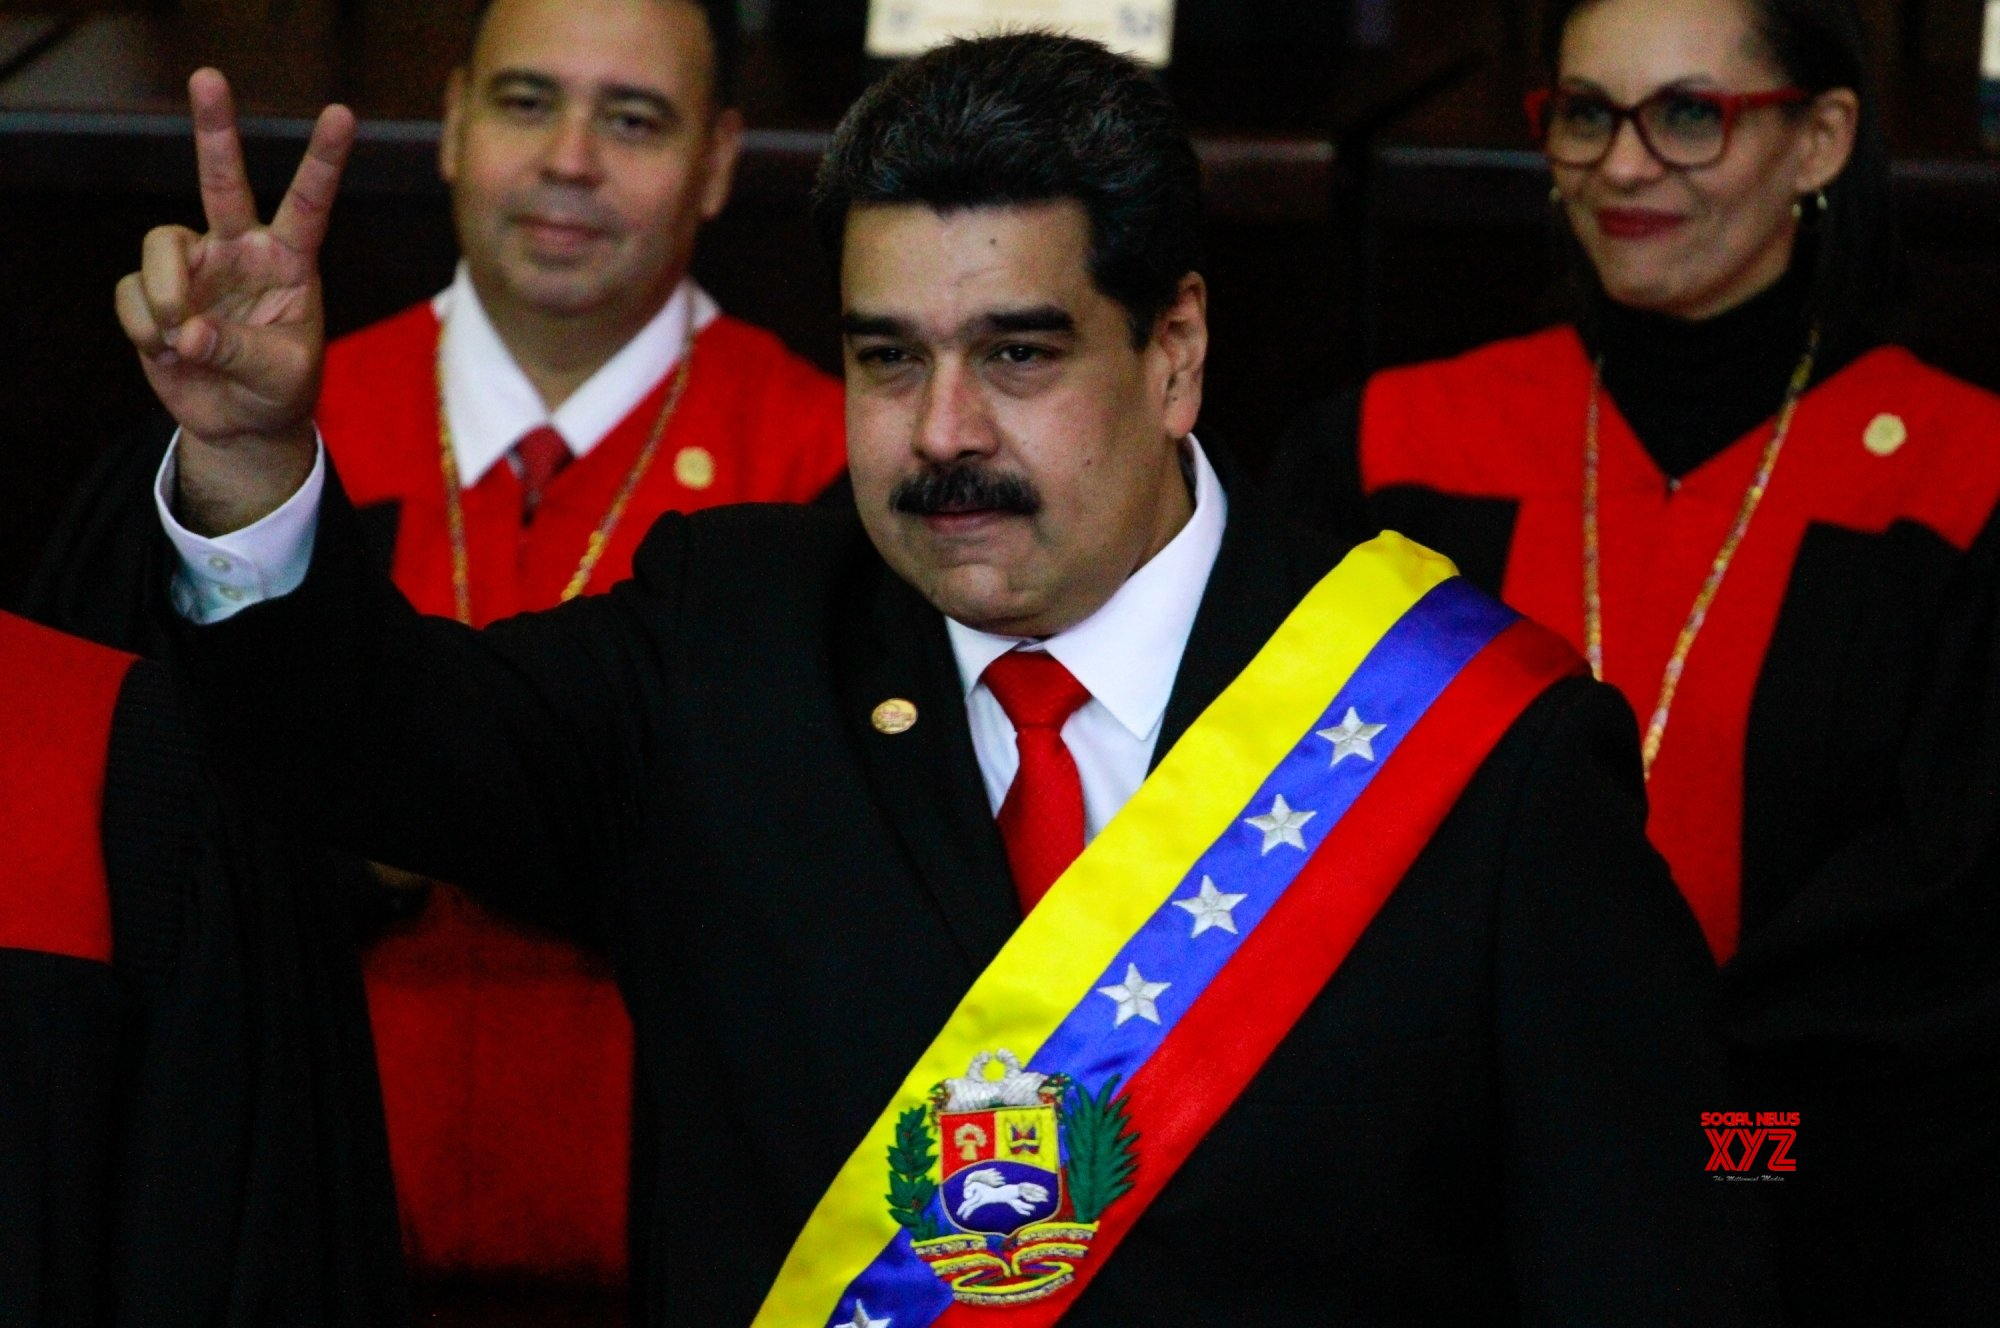 VENEZUELA - CARACAS - NICOLAS MADURO - PRESIDENTIAL INAUGURATION #Gallery